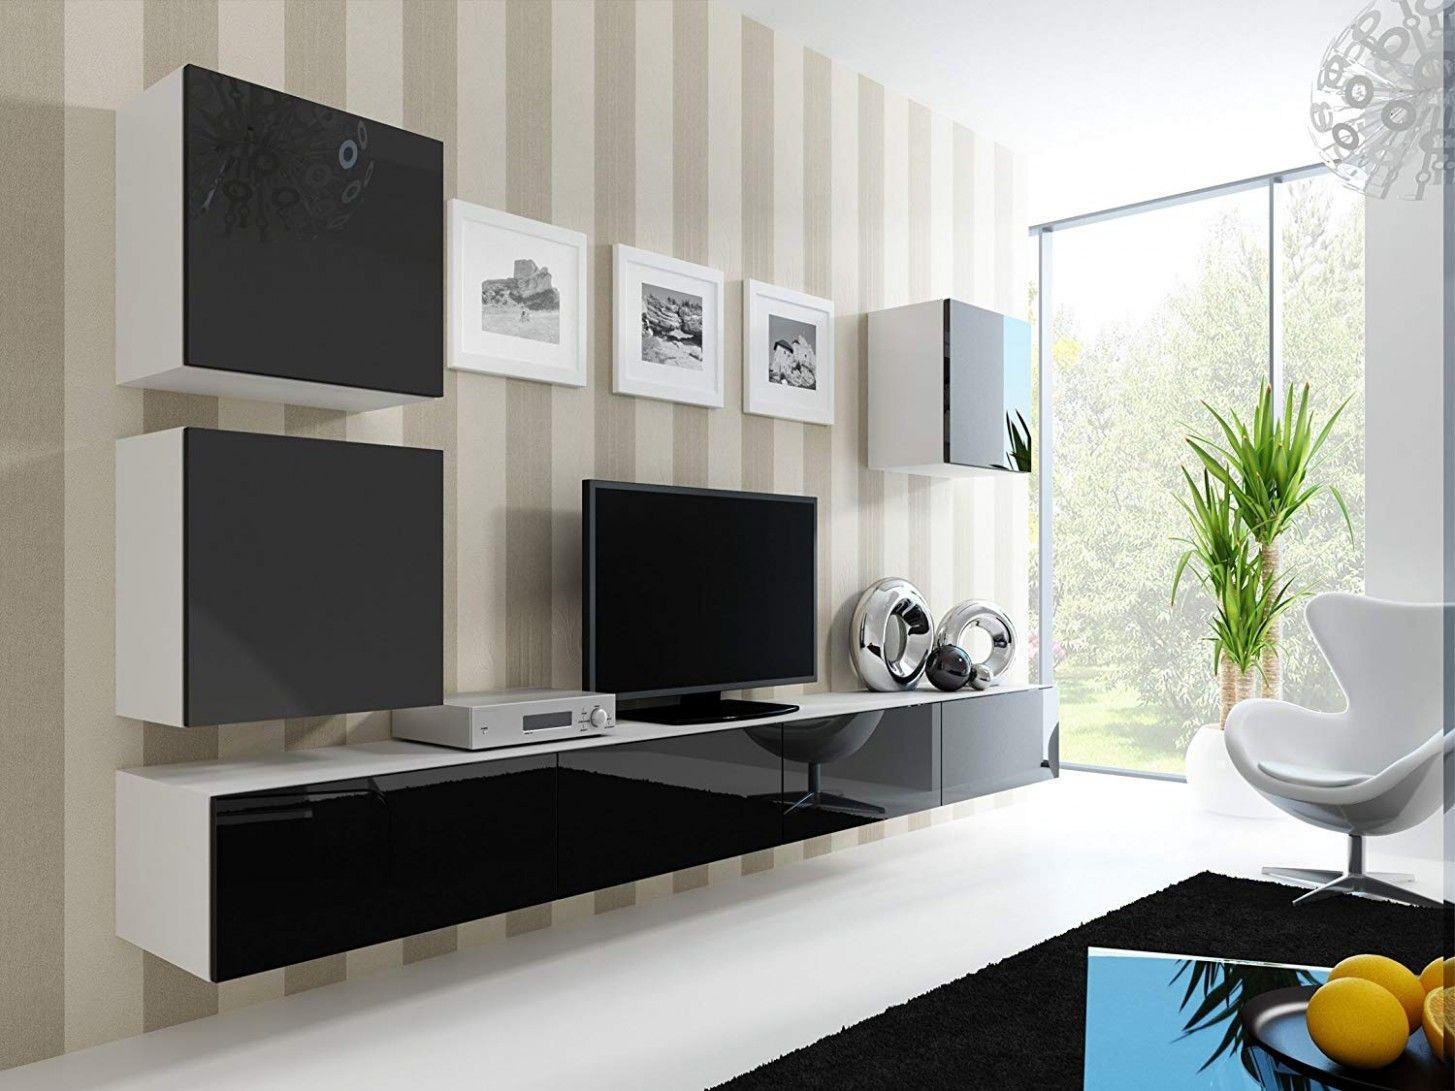 Pin On Living Room Ideas